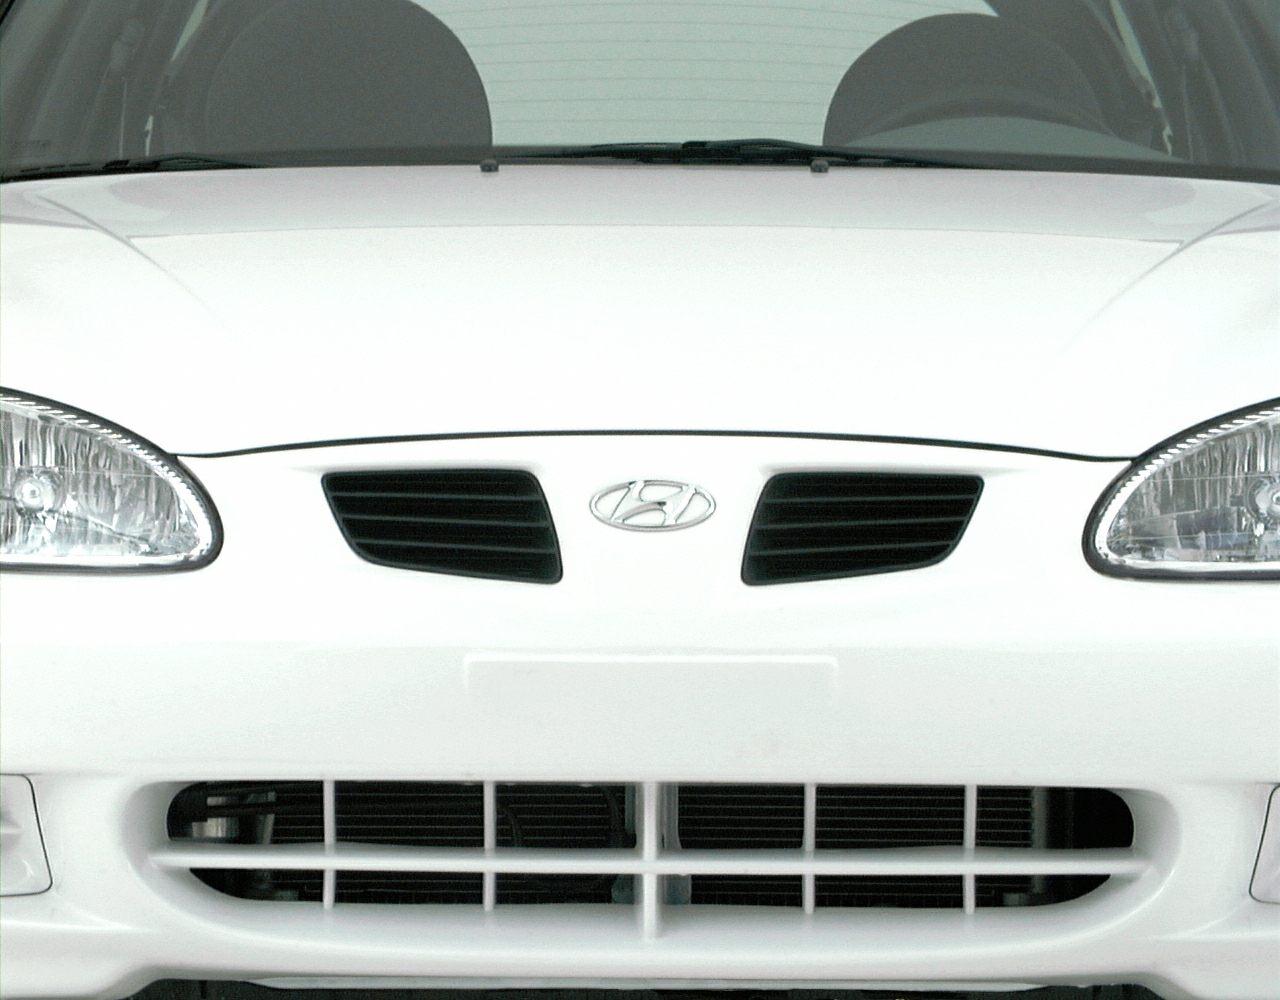 2000 Hyundai Elantra Gls 4dr Station Wagon Pictures